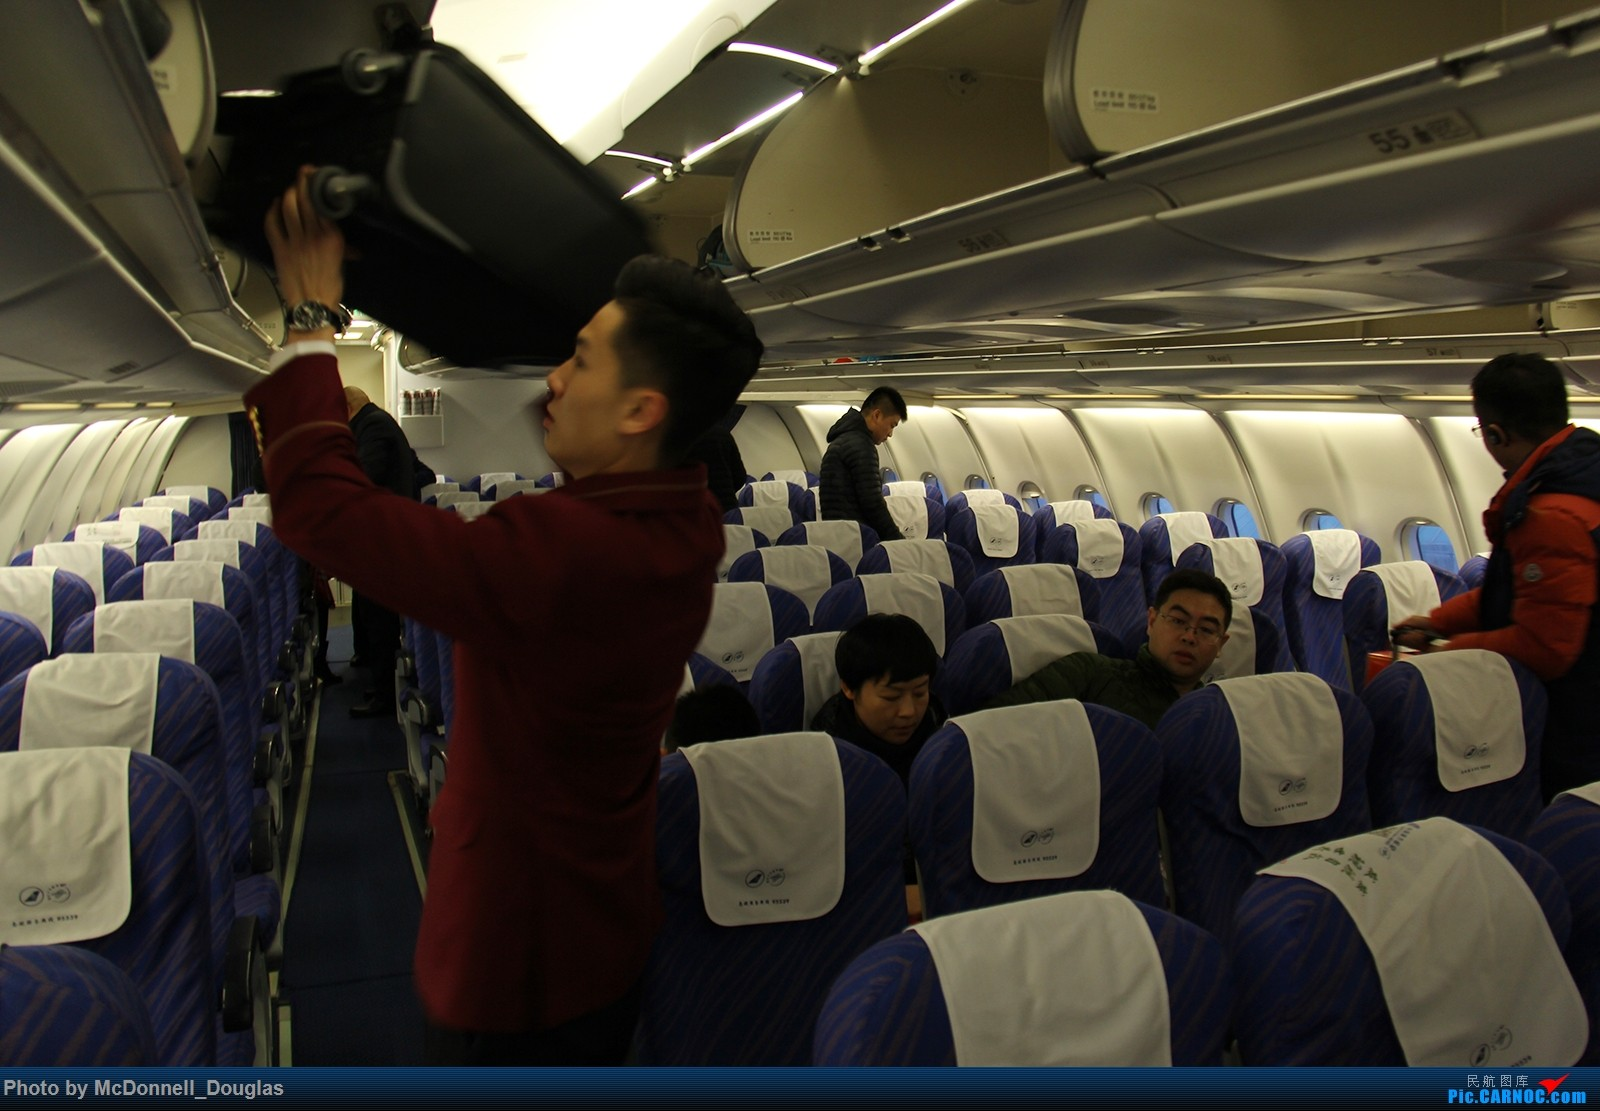 Re:[原创]【上海飞友会】【zc带你游天下(4)】不远千里飞跃喜马拉雅去看你,探寻高山另一边的神秘国度,和一群贫穷却快乐着的人们 AIRBUS A330-243 B-6059 中国北京首都国际机场